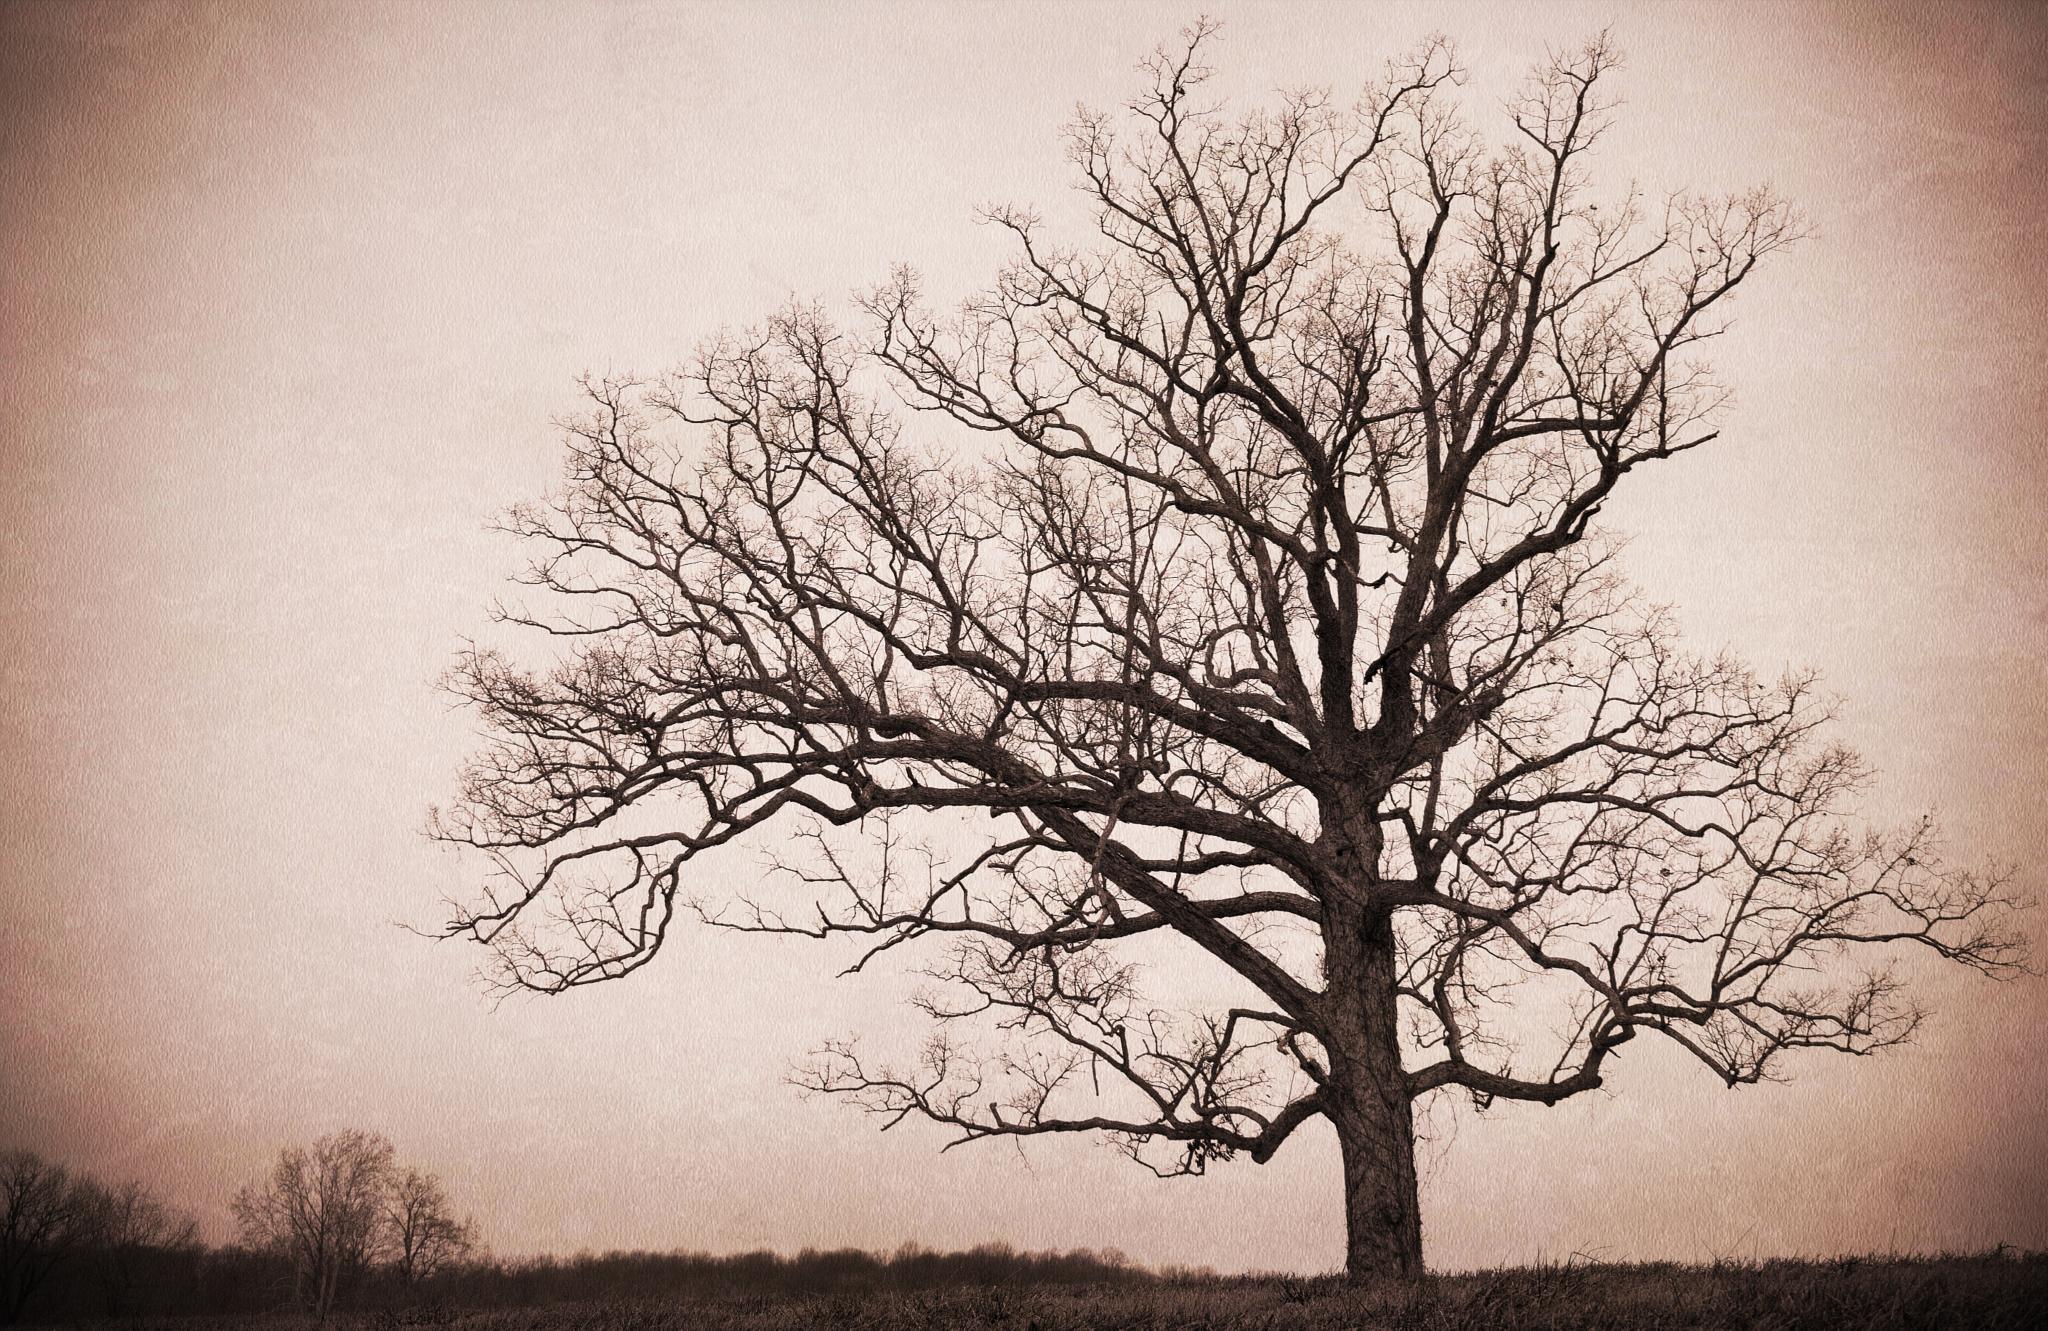 Scary Tree by rick.moss.654